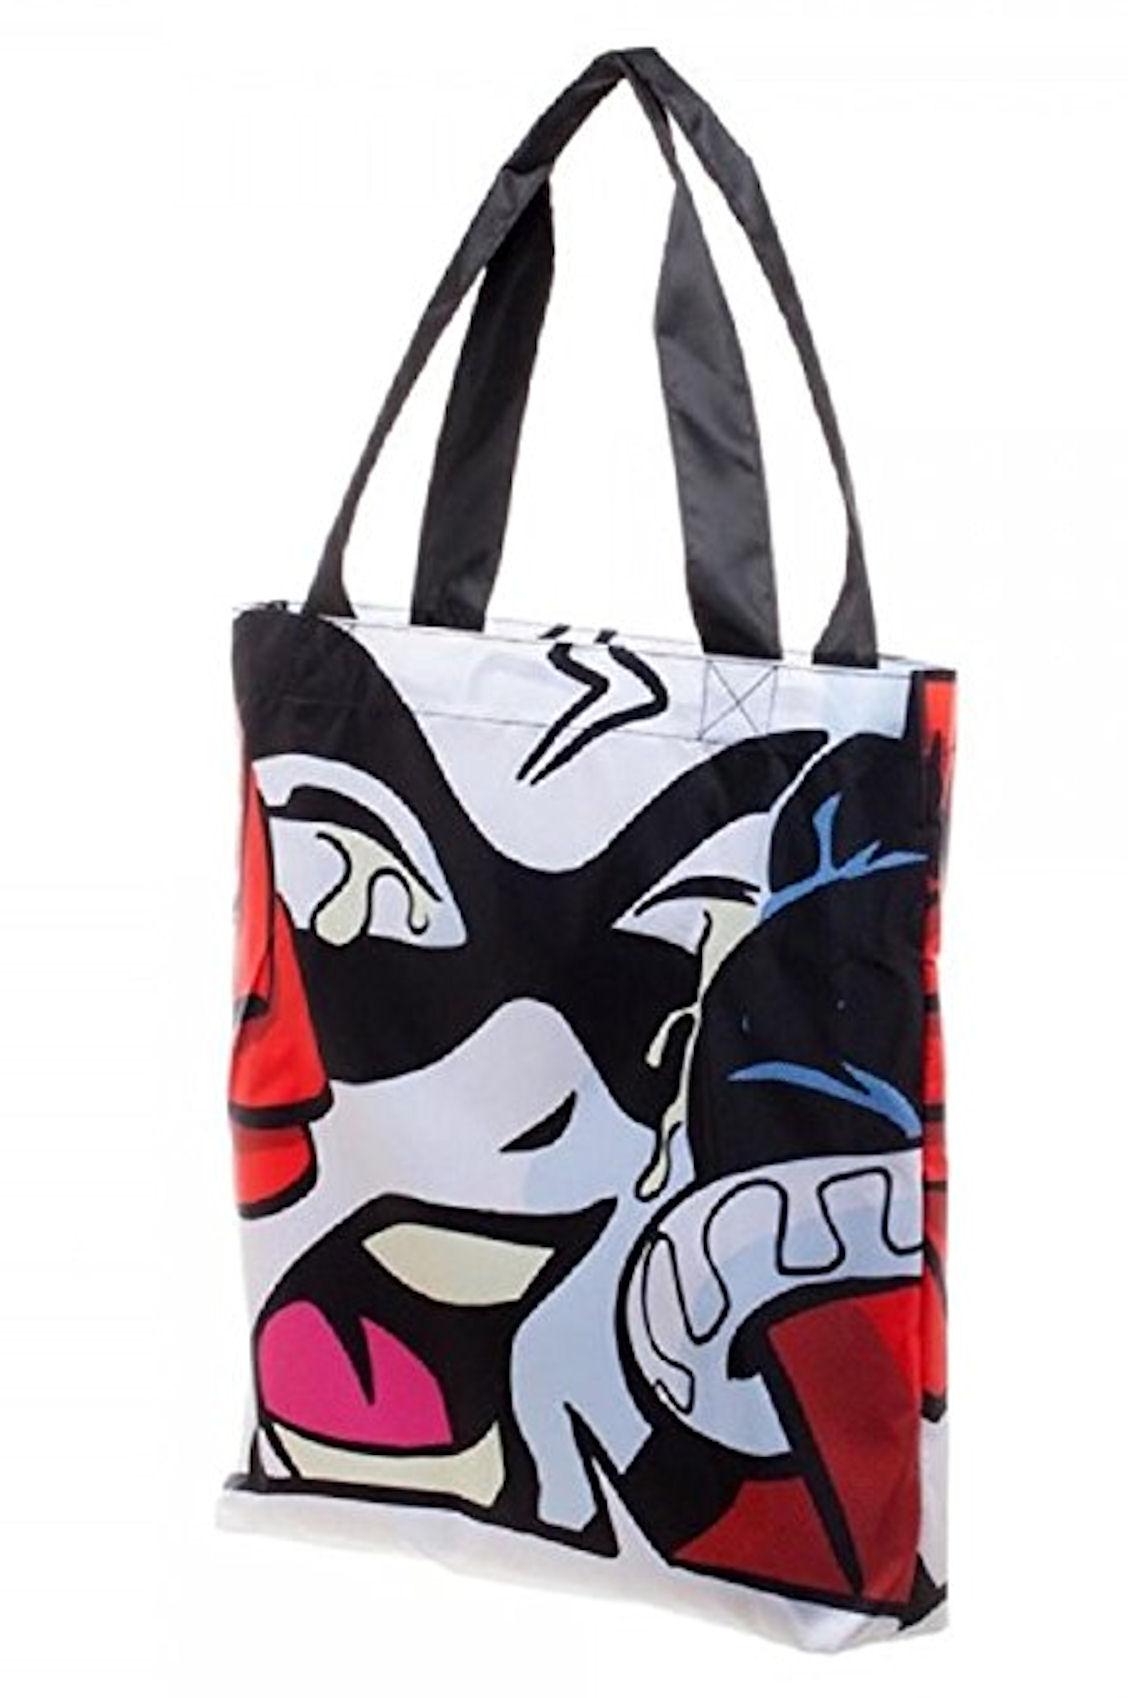 DC Comics Harley Quinn Packable Tote